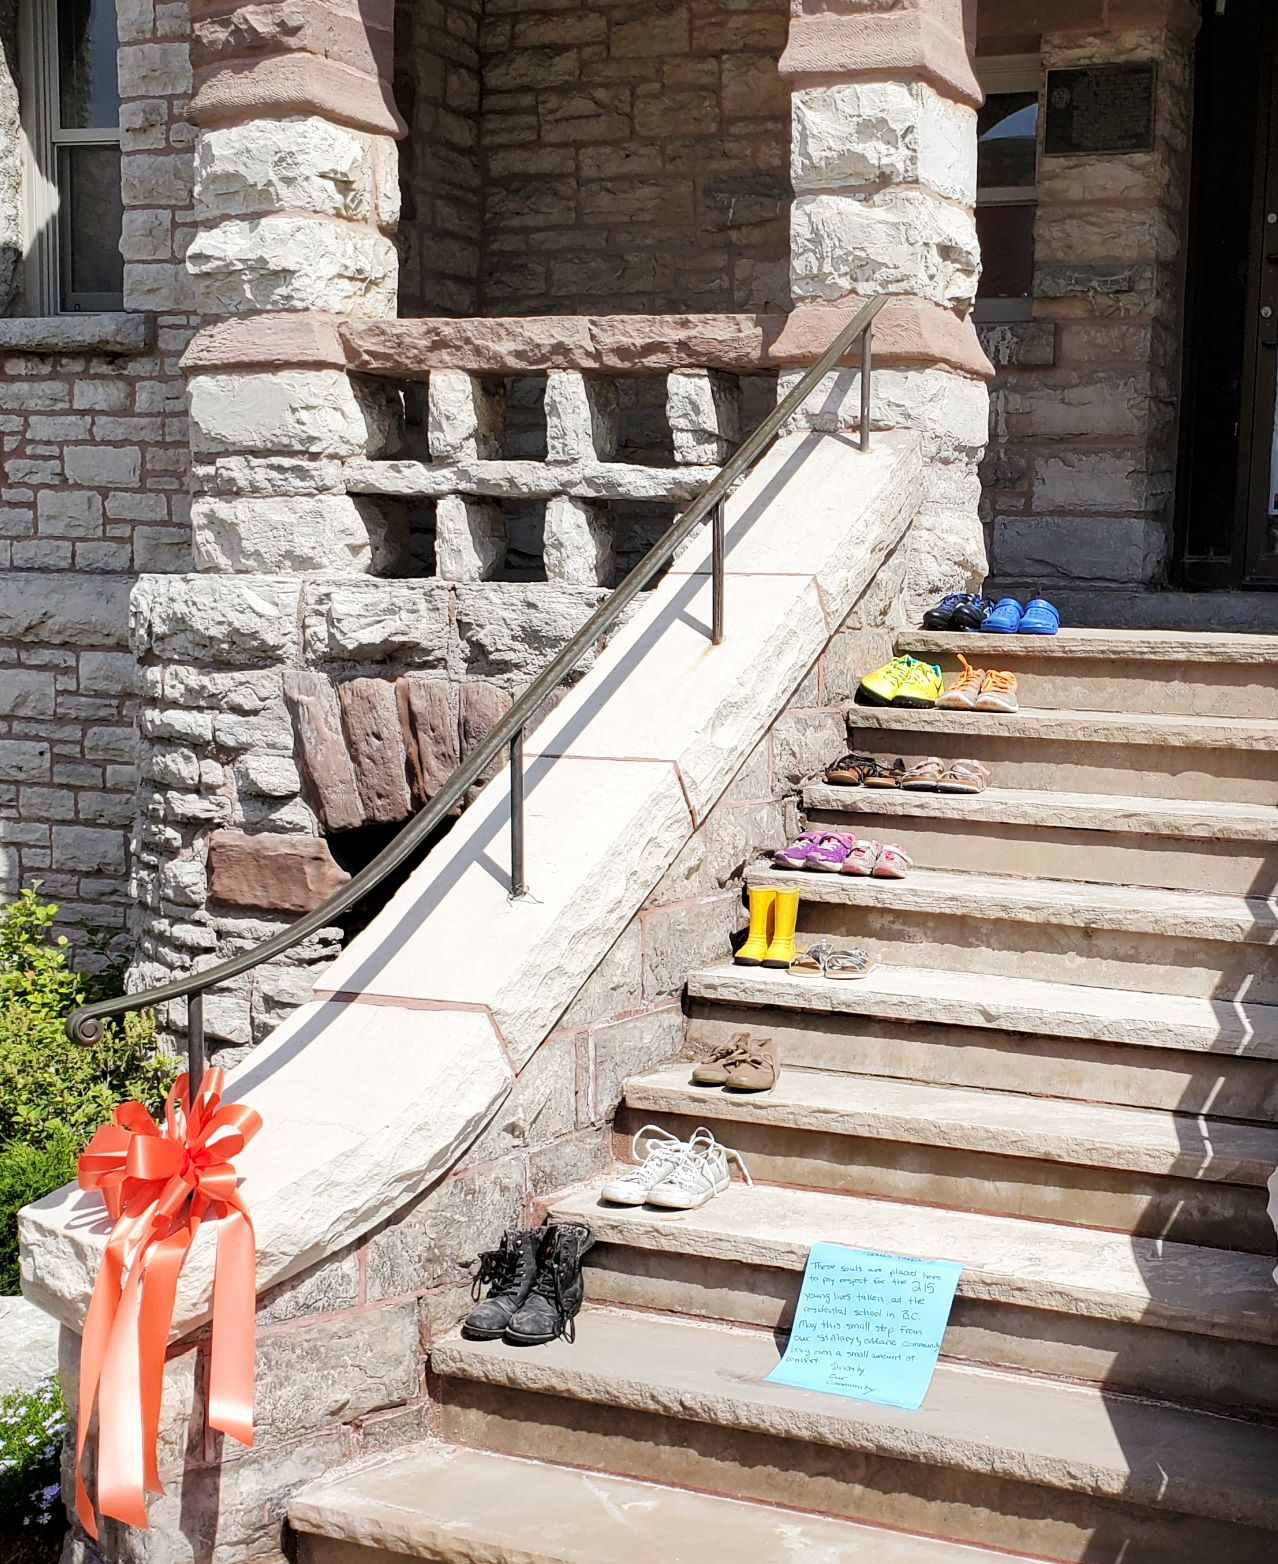 Residential School Memorial at St